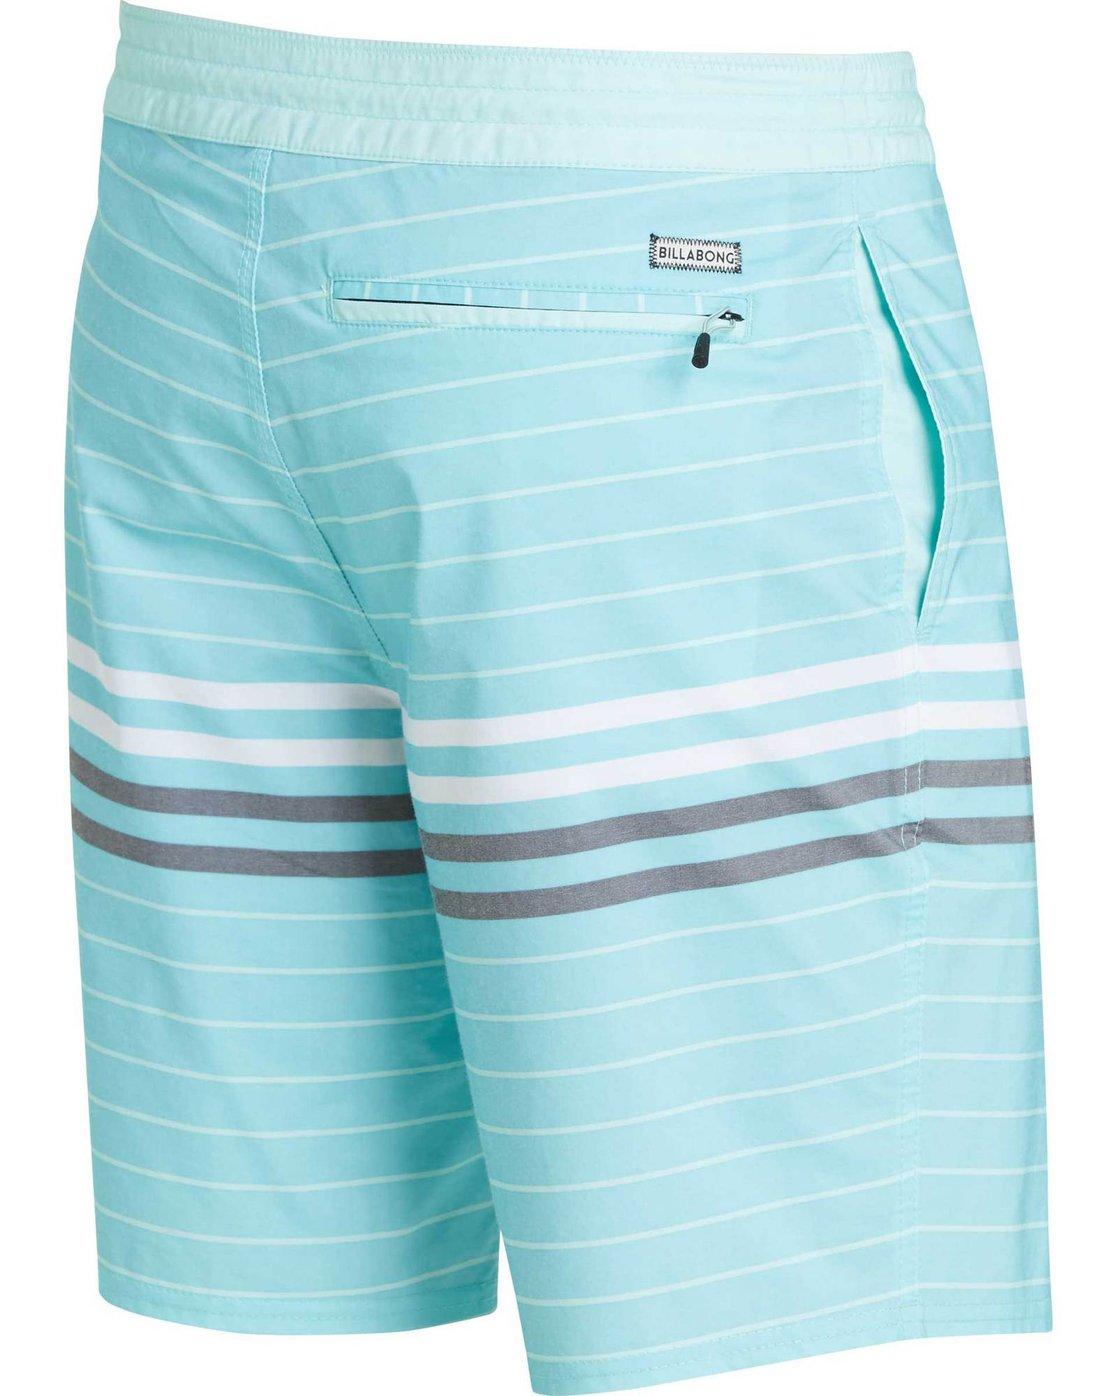 "Billabong METHOD Black Blue Striped Floral Recycle Series 20/"" Men/'s Boardshorts"